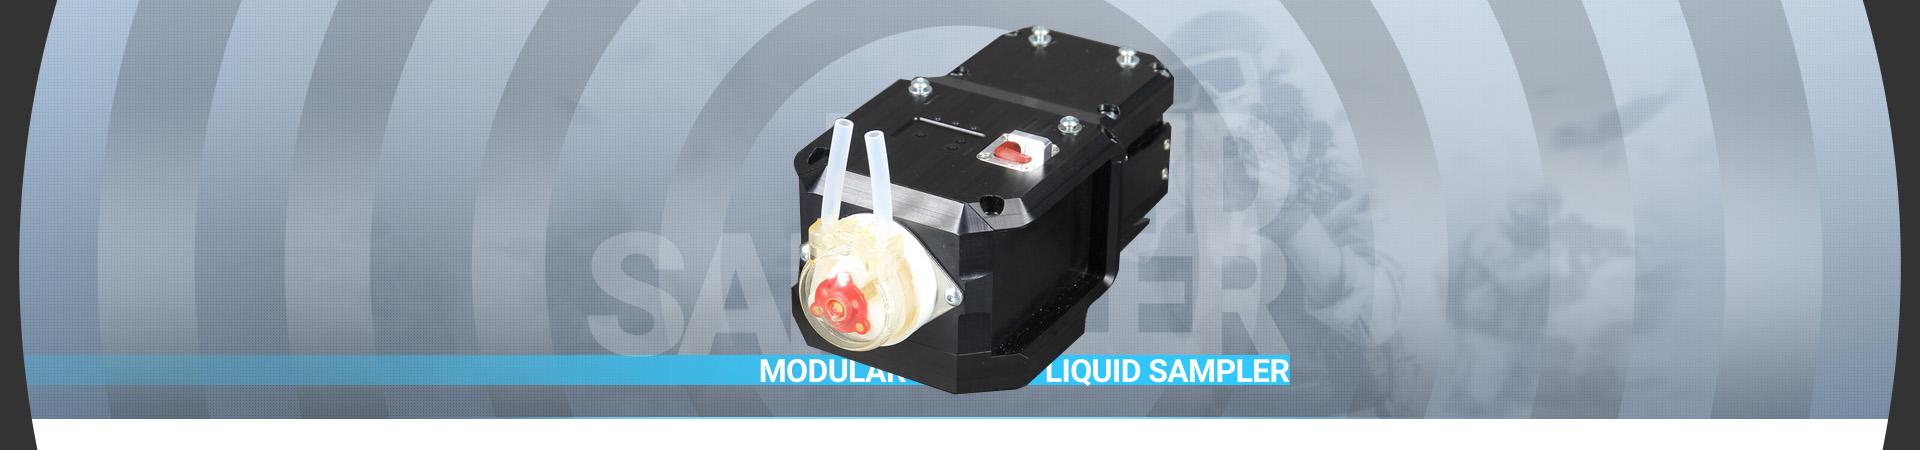 Modular Liquid sampler